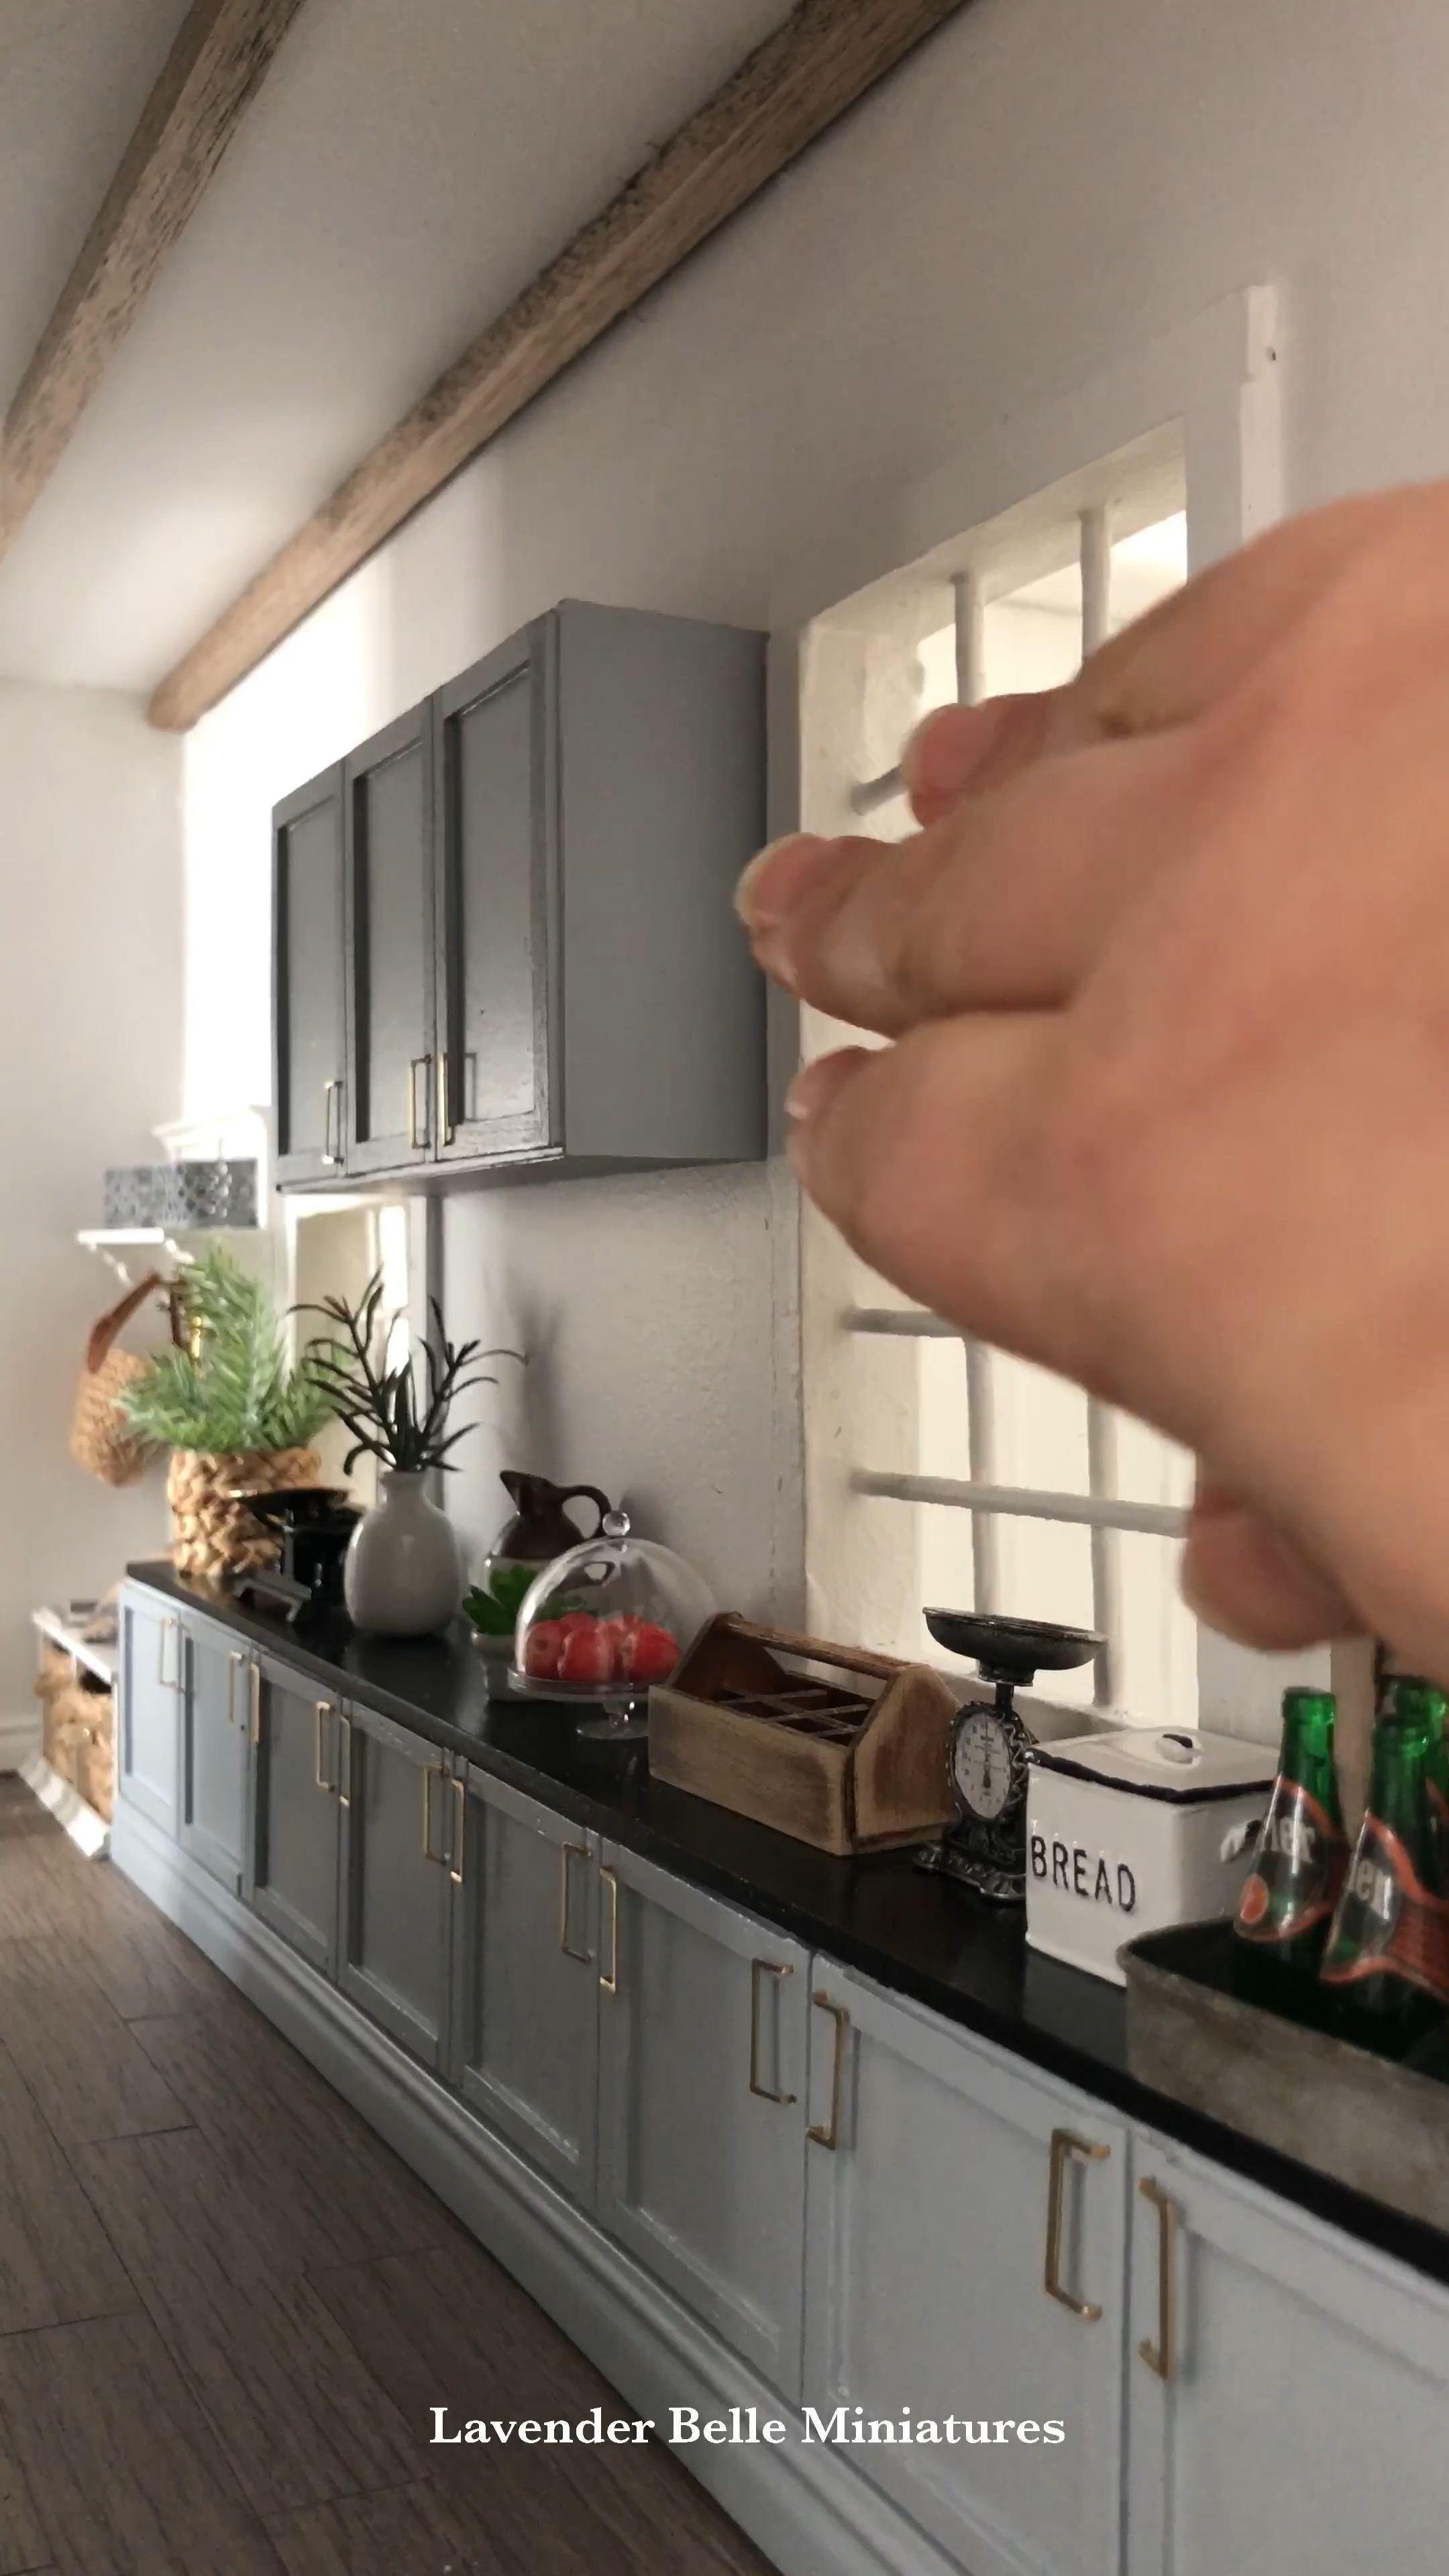 Last Kitchen Cabinet Fitted In Willowbridgehouse Dollhouse Miniatures 1 12 Scale Miniaturekitchen Last In 2020 Dolls House Interiors Miniature Kitchen Miniature Diy